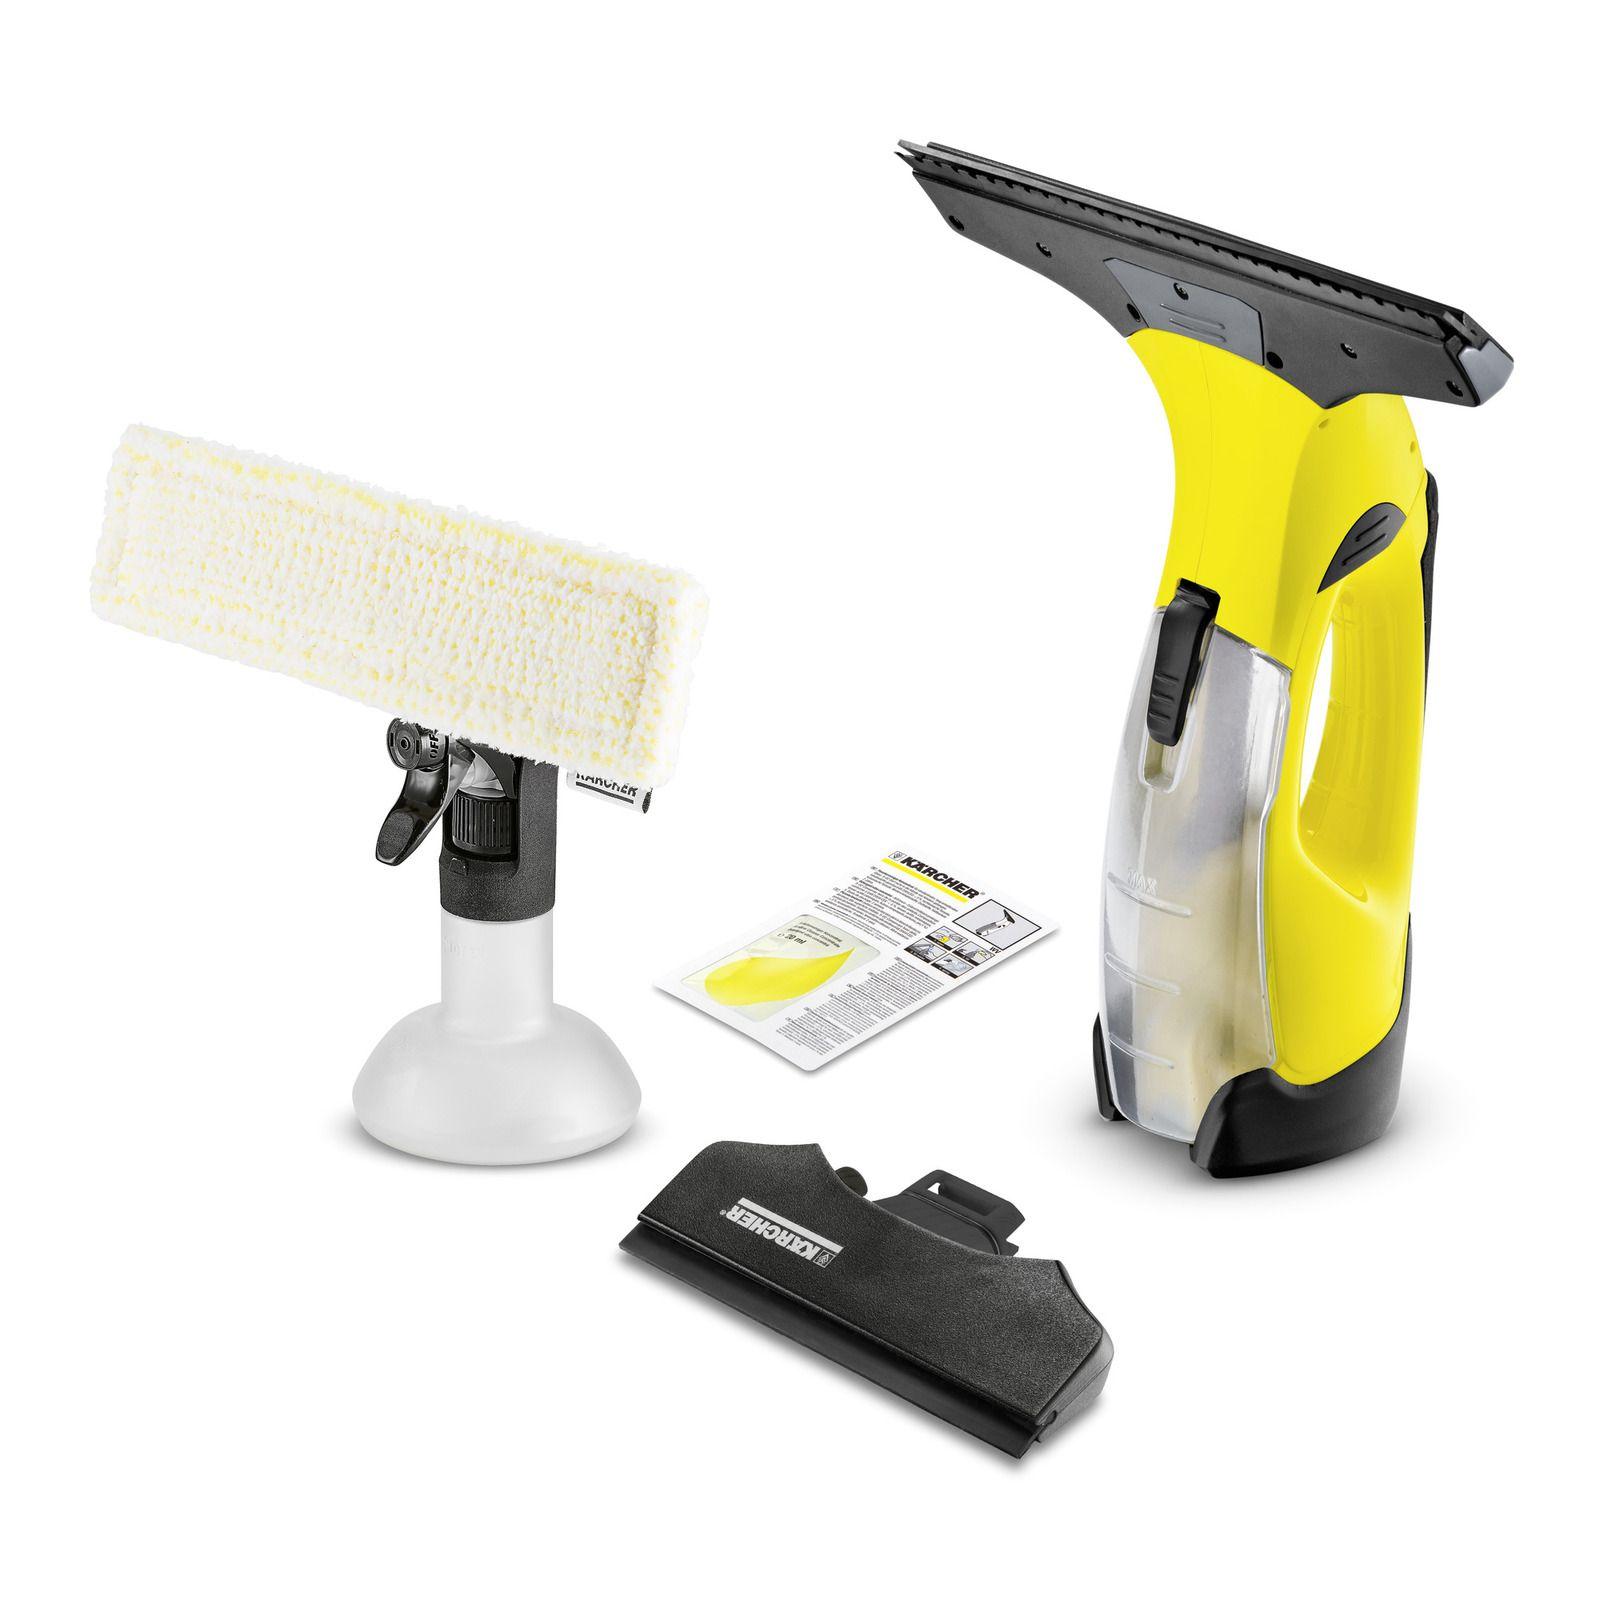 Wv5 Premium Window Vac Karcher Uk Window Cleaner Vacuum Cleaner Shower Cabinets